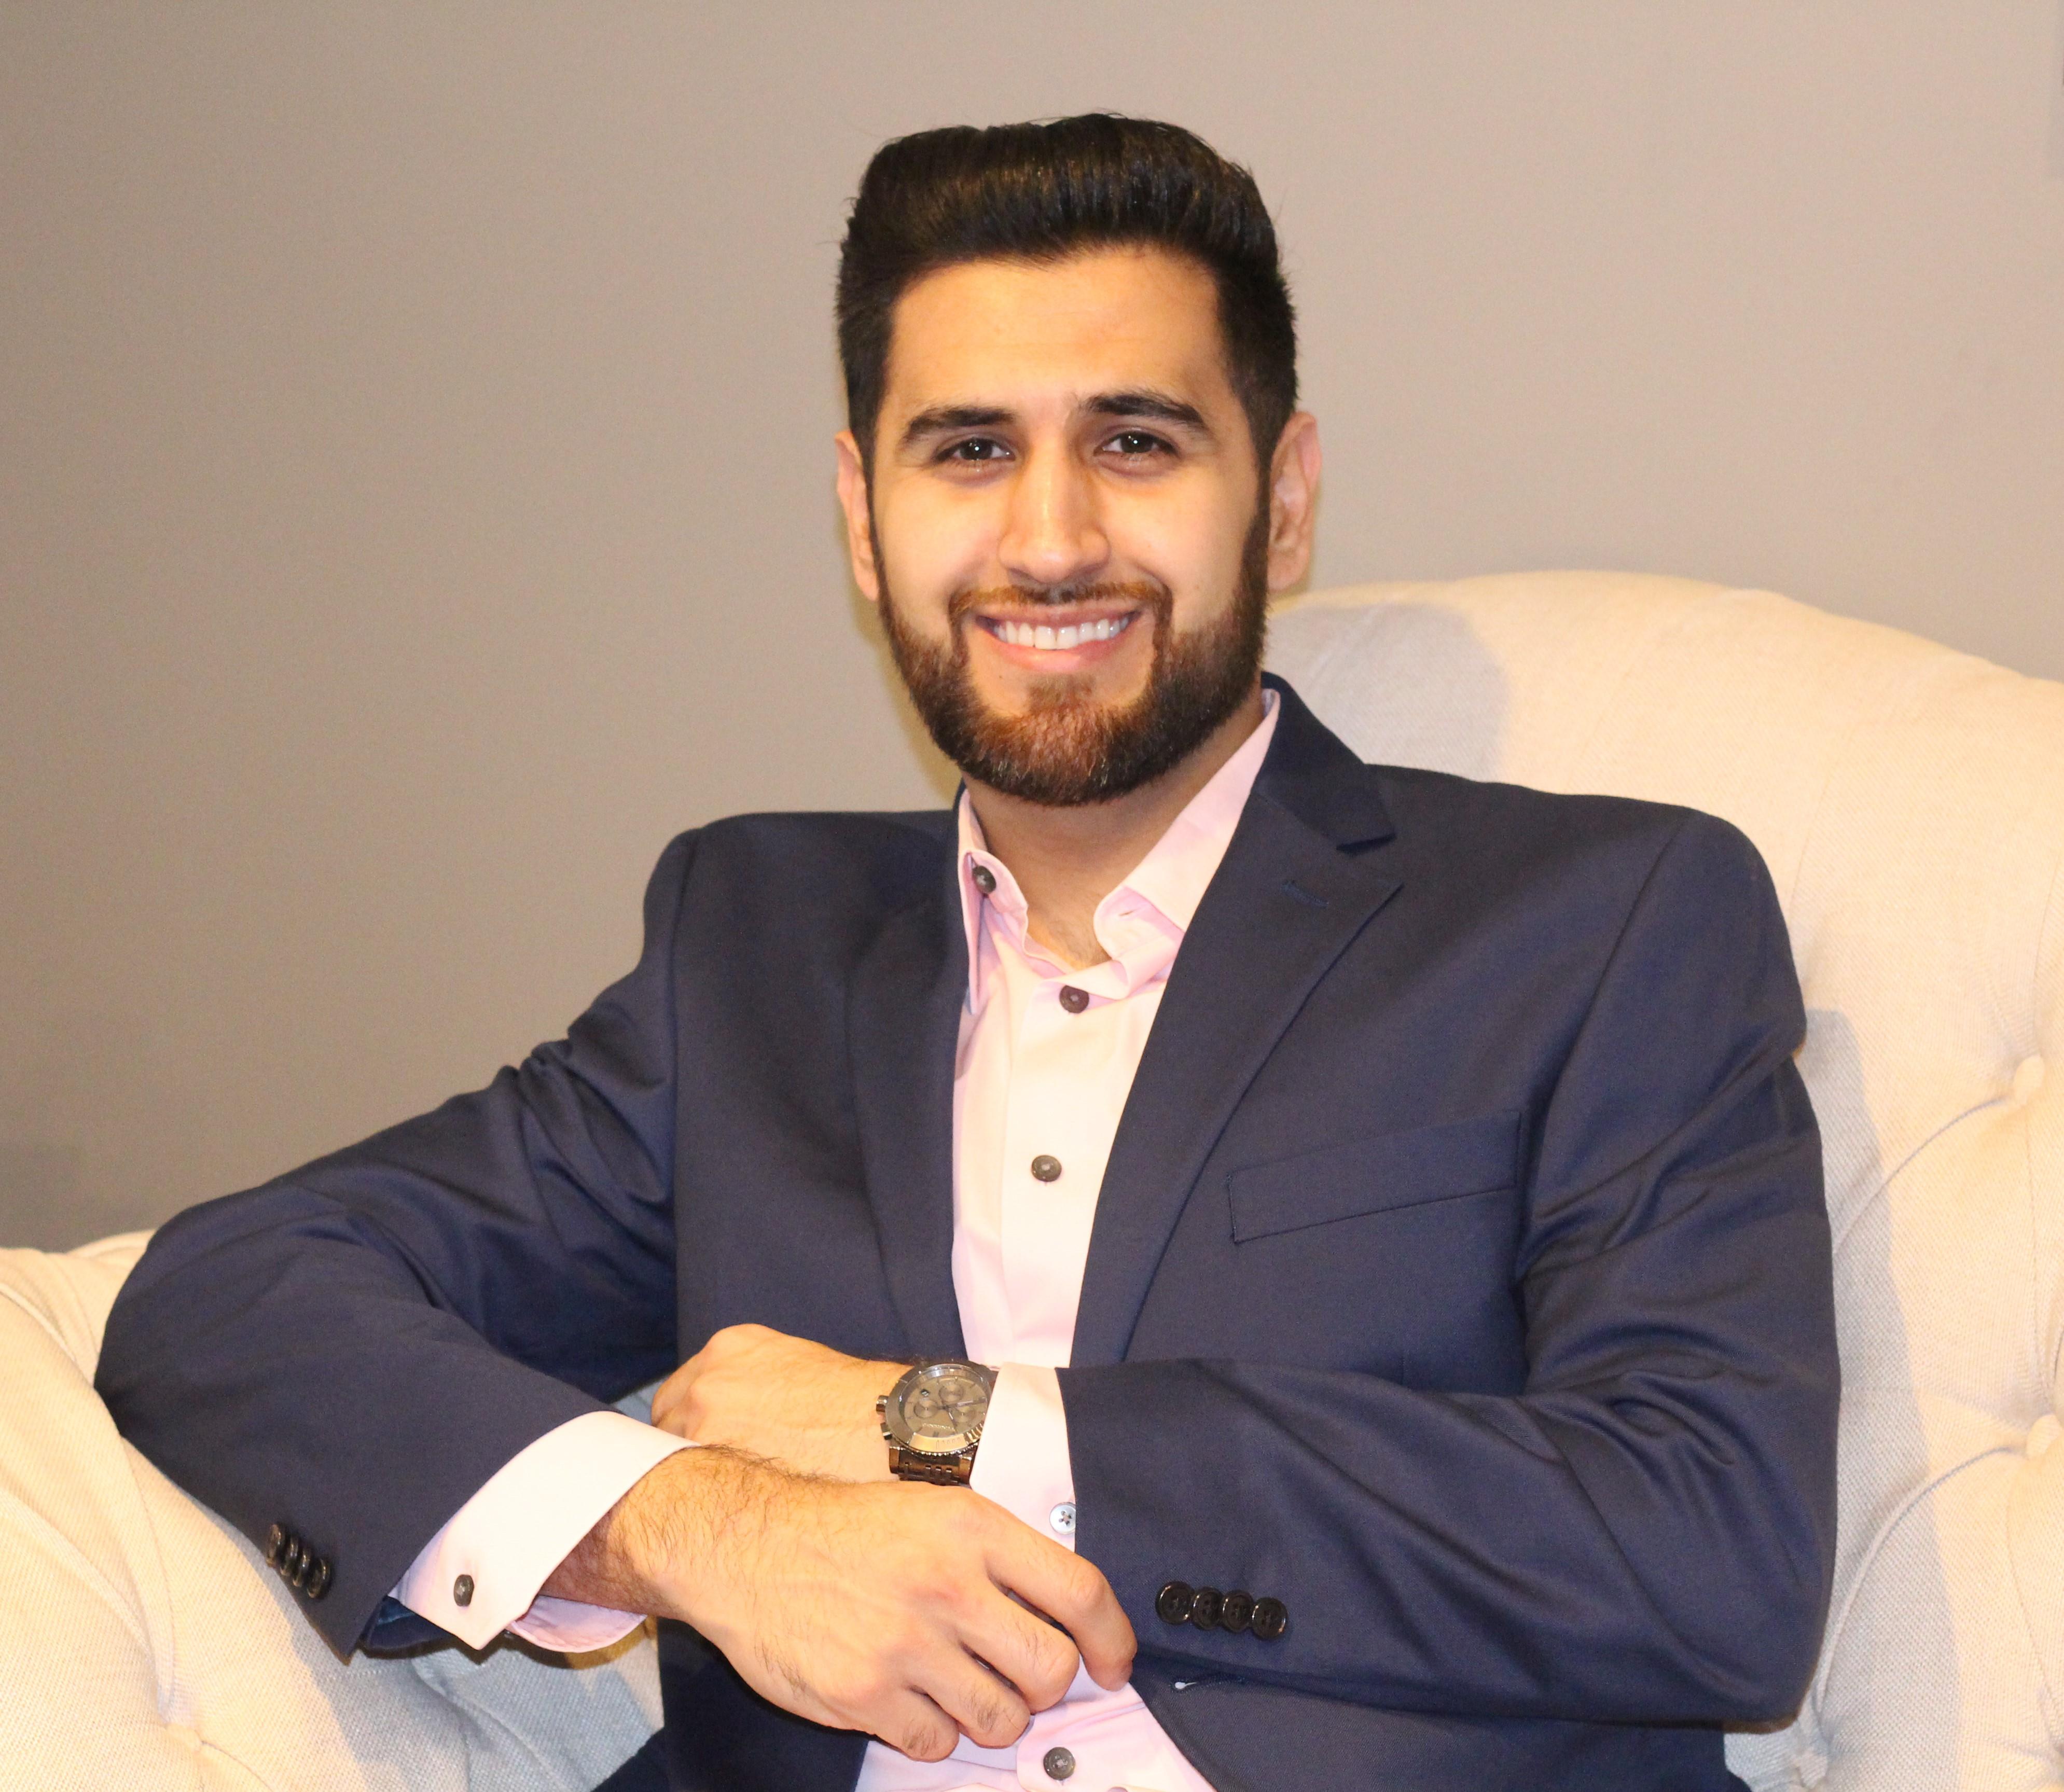 Omeed Alizada